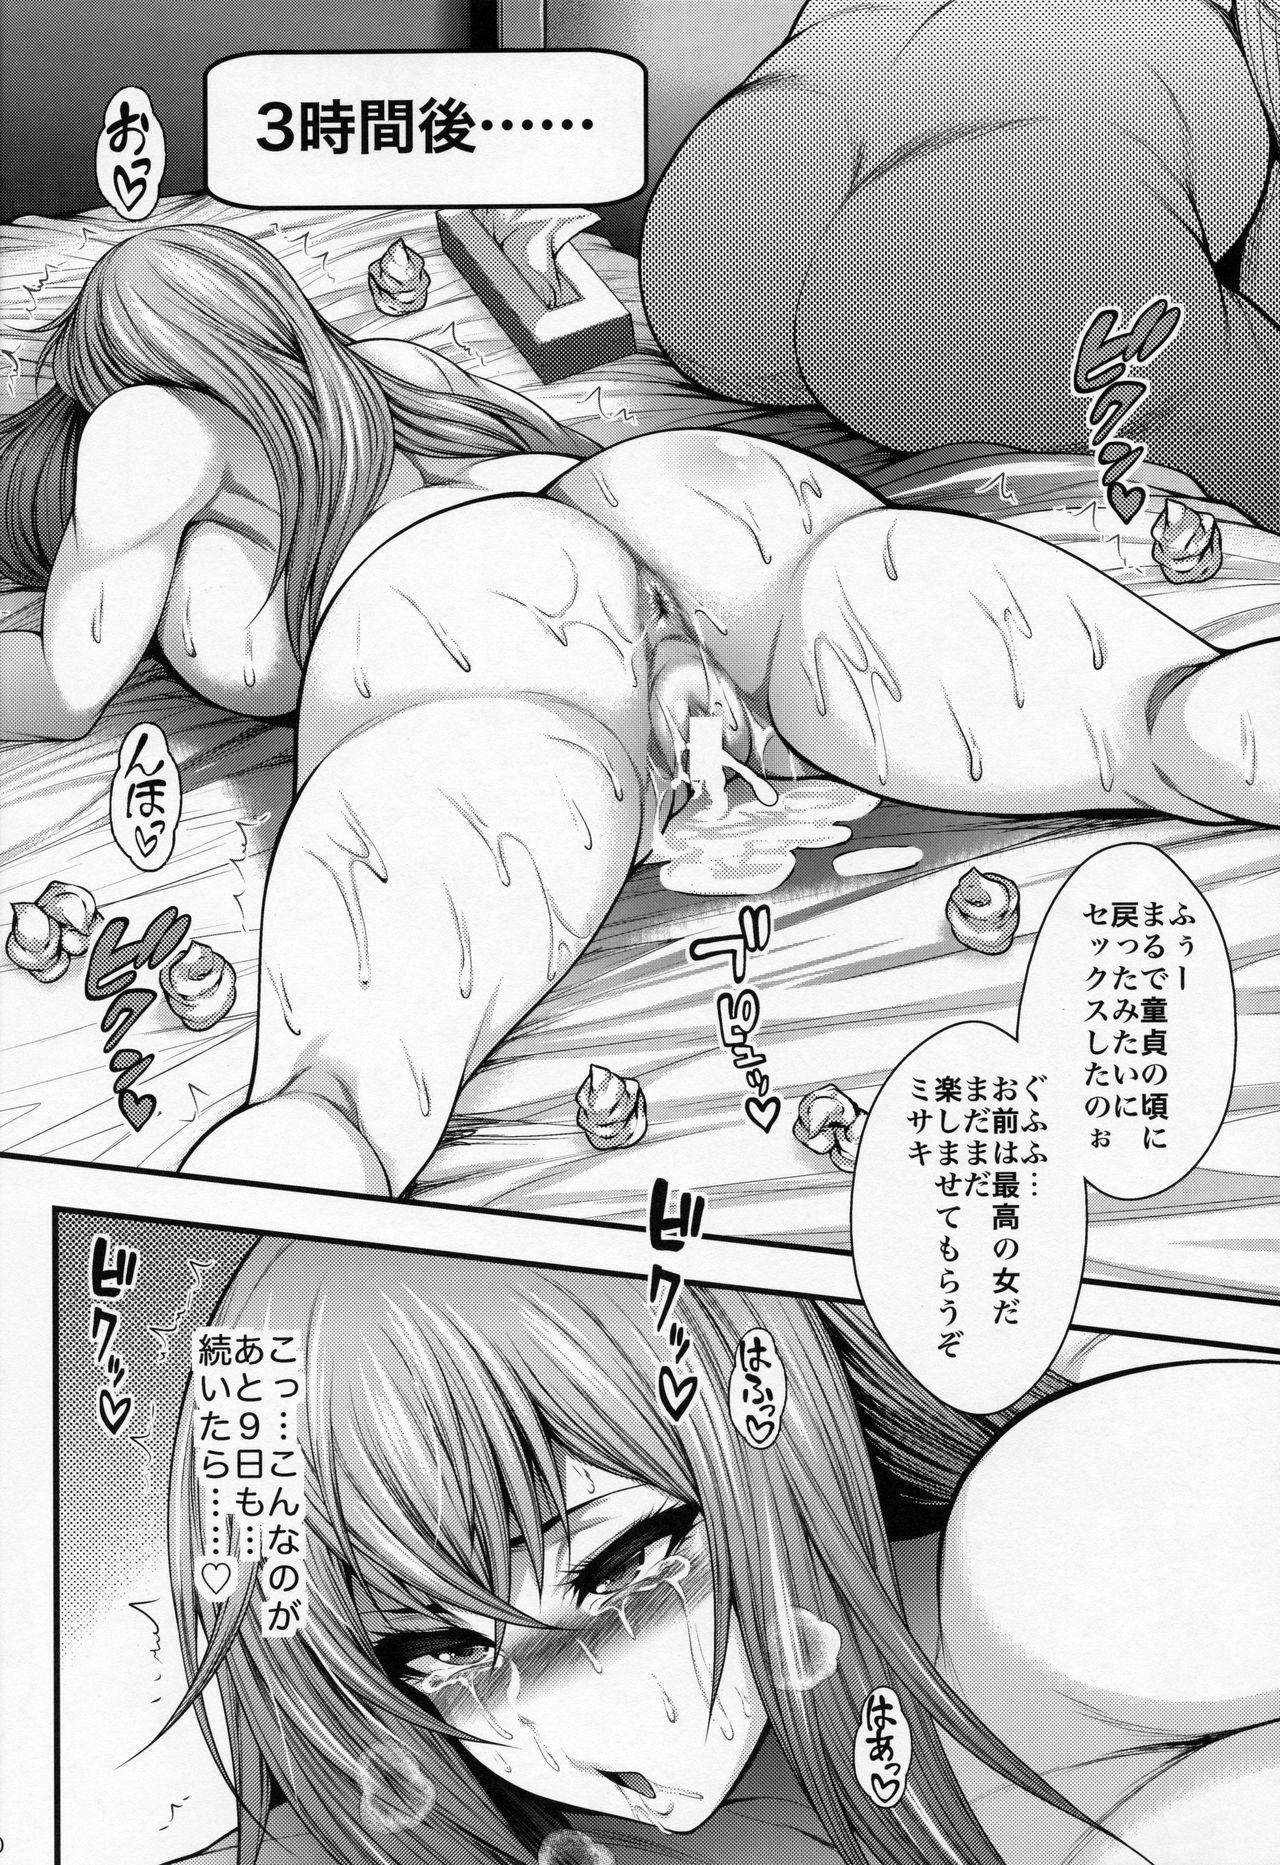 Misaki Otoshi 18